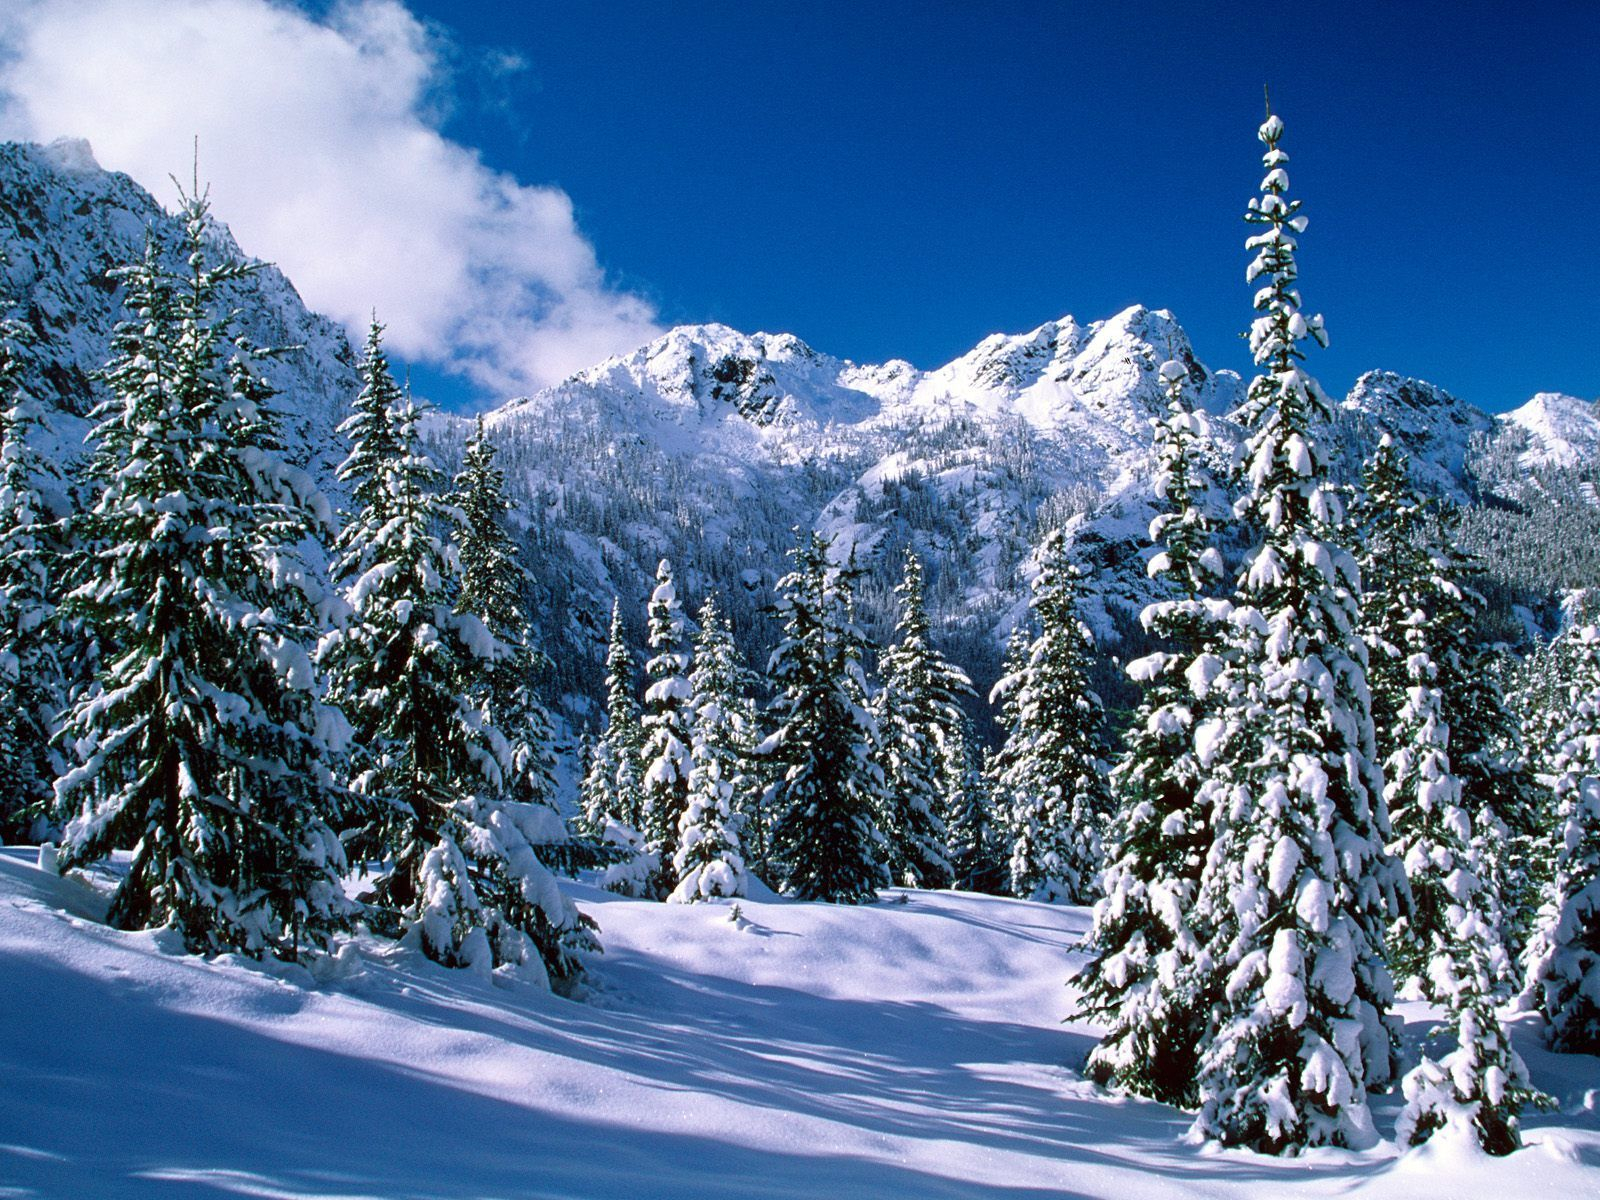 Wonderful Wallpaper Home Screen Snow - snowy_mountains151  HD_628633.jpg